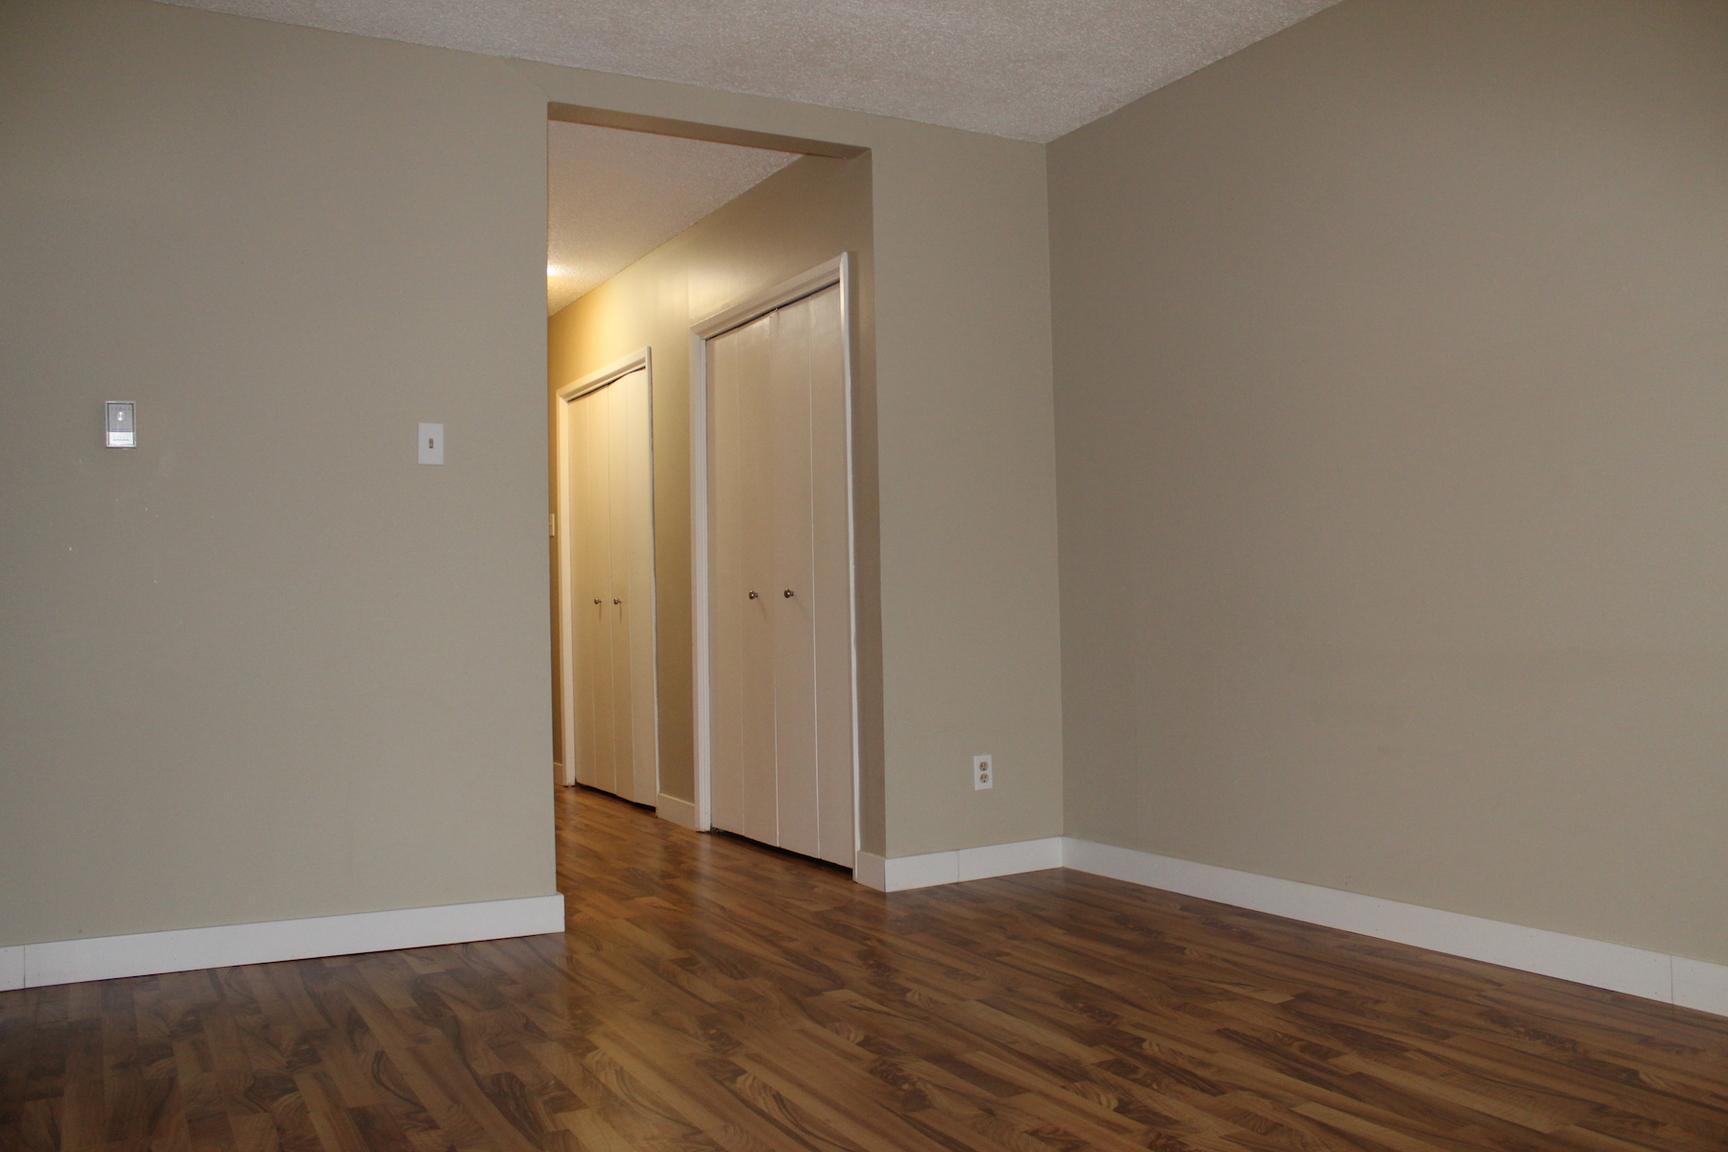 324 4 Ave NE, Calgary, AB - $1,100 CAD/ month